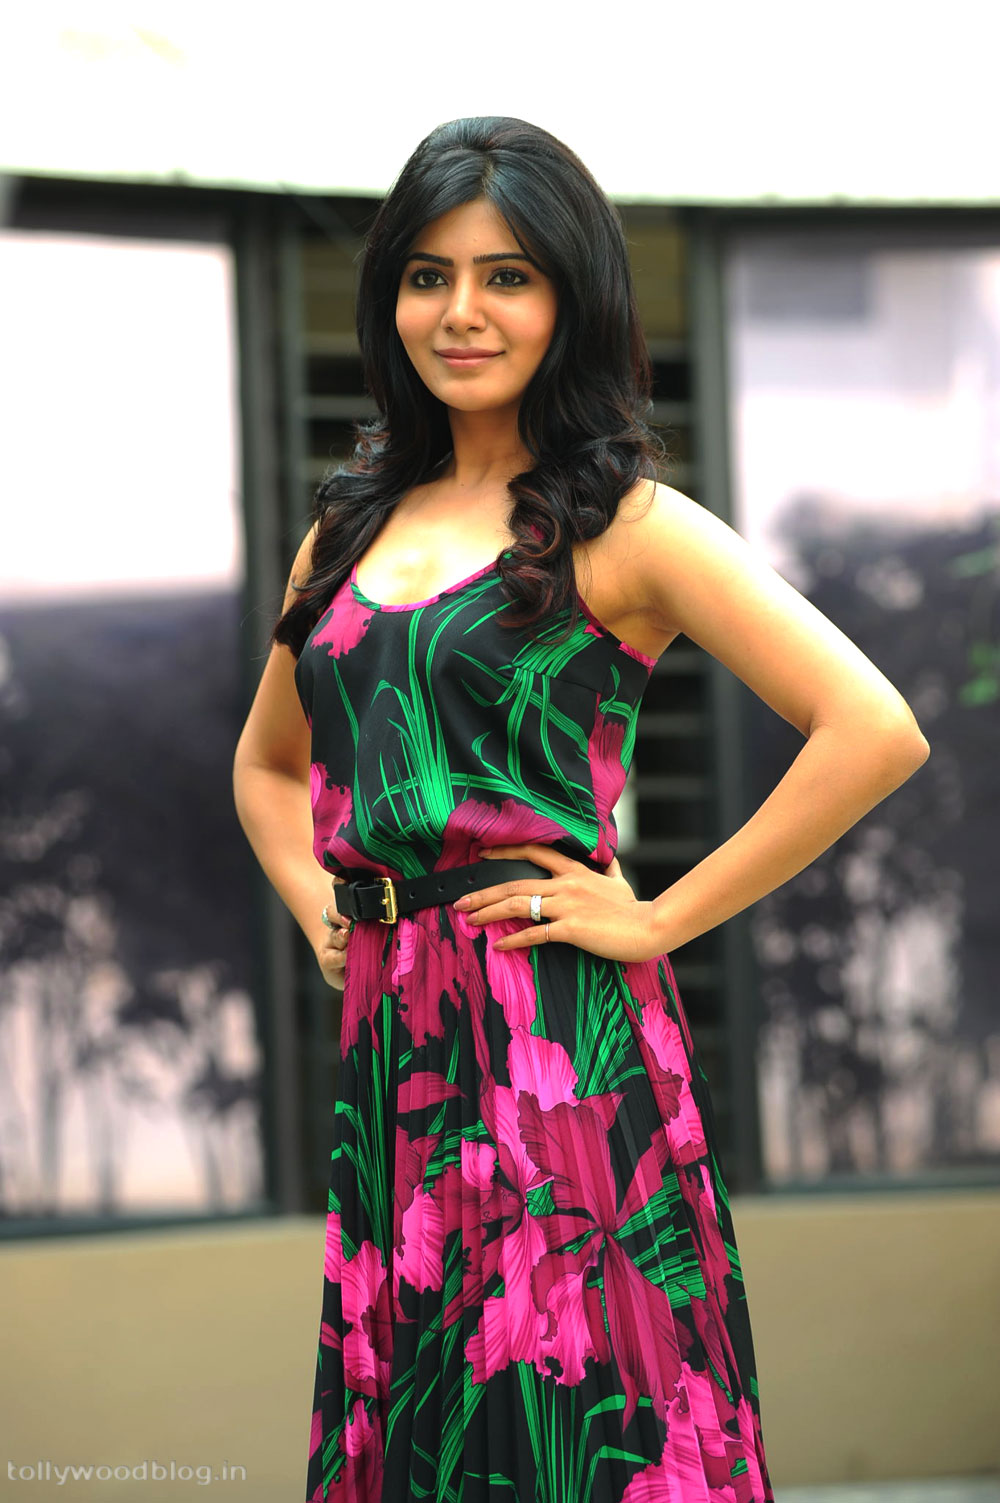 ... pics gallery at her upcoming Telugu movie jabardast press meet